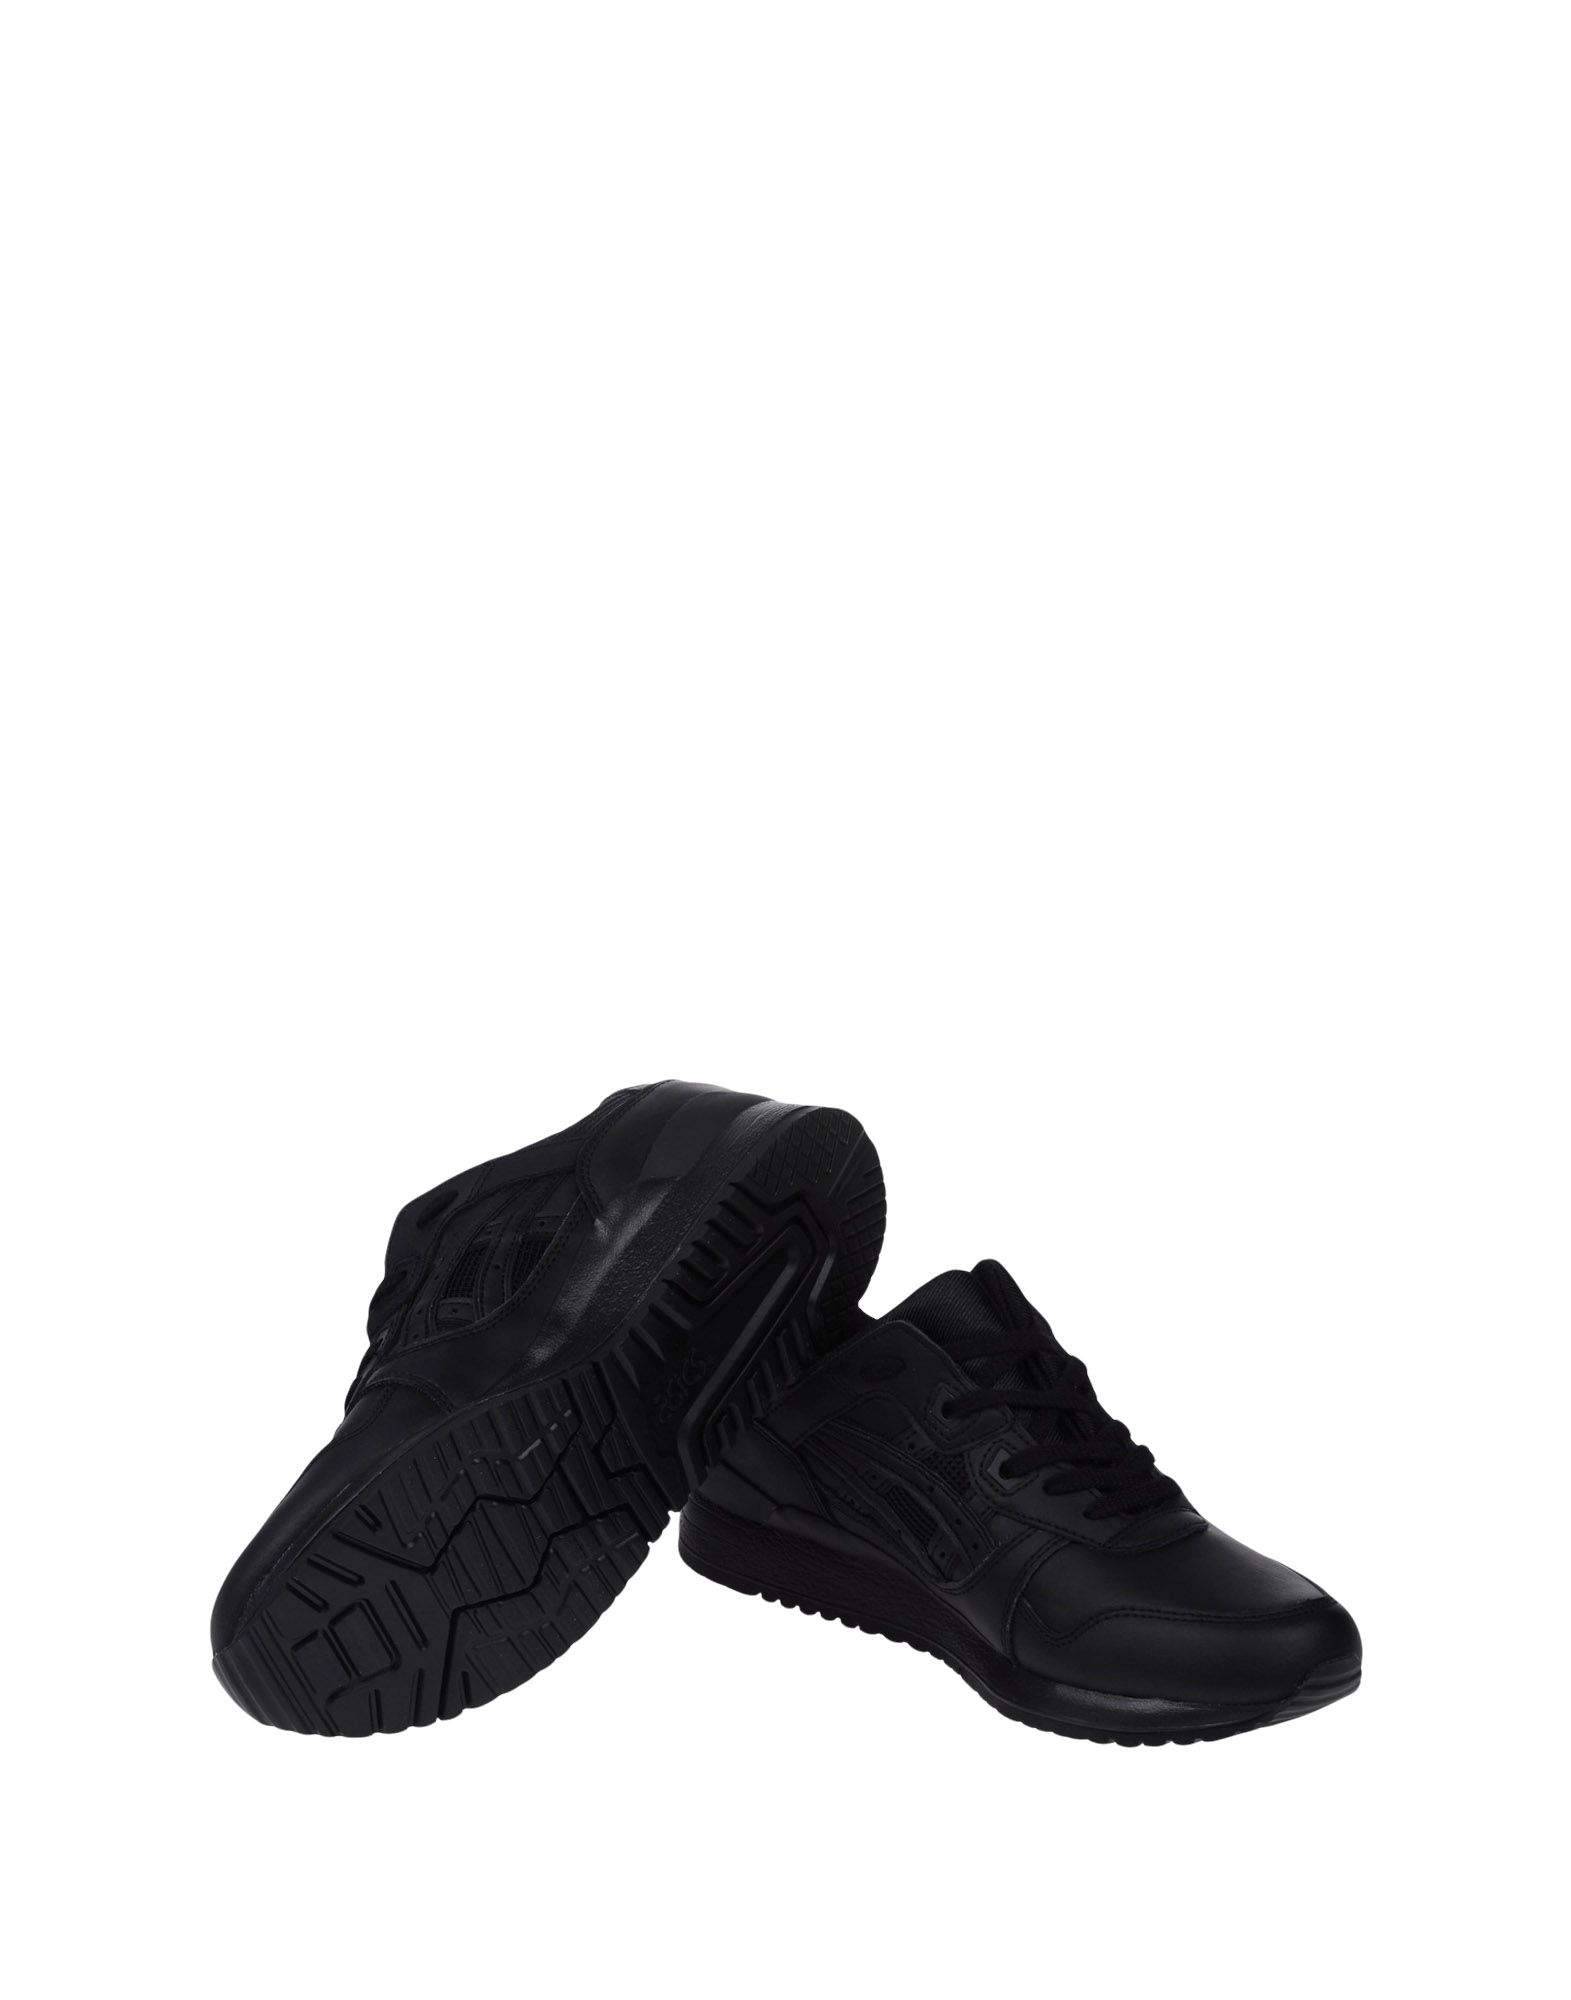 Sneakers Asics Tiger Gel-Lyte Iii - Femme - Sneakers Asics Tiger sur